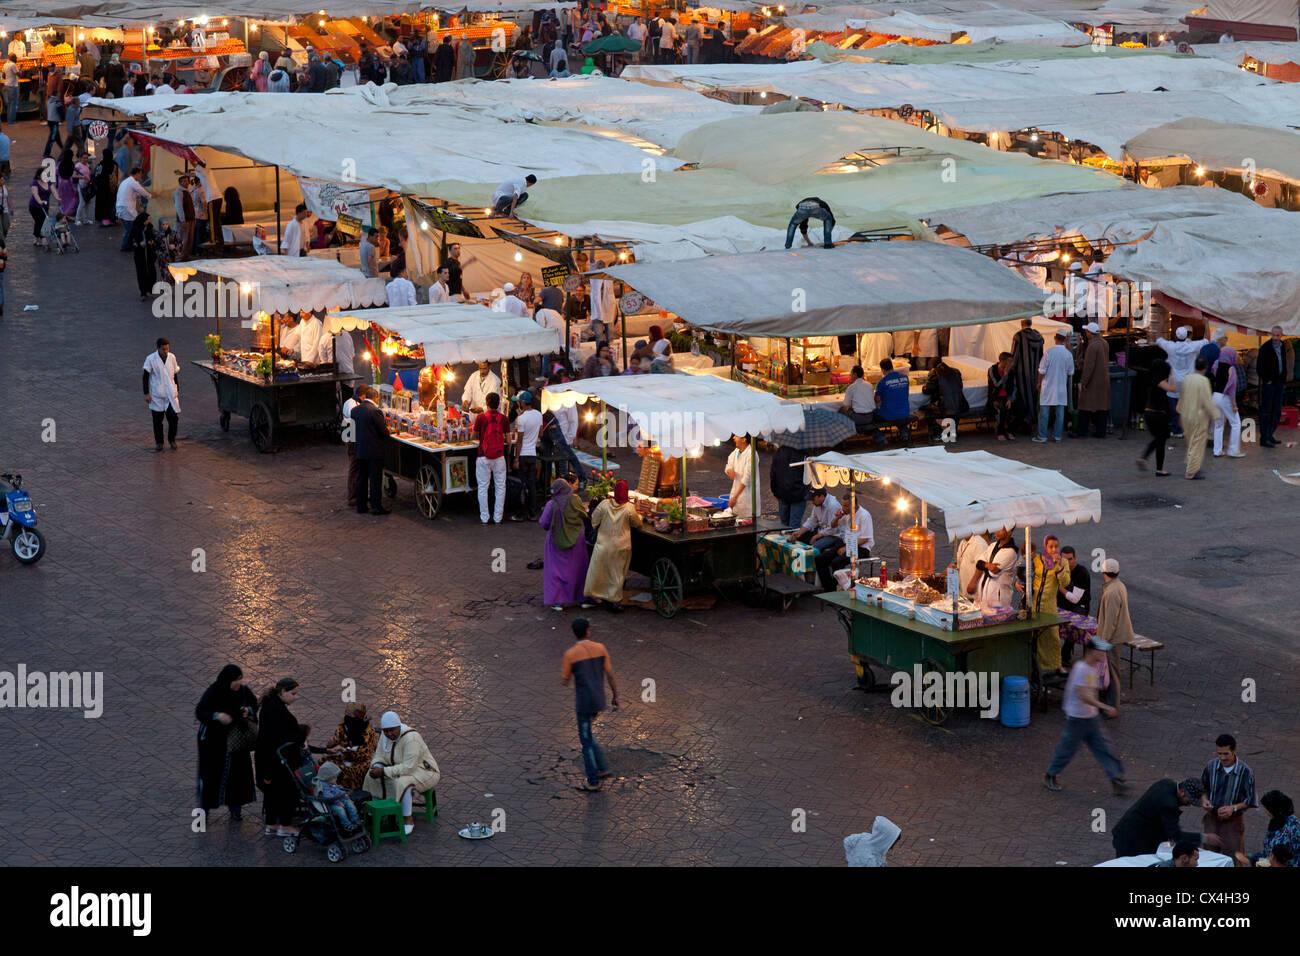 Food stalls at the Jamaa el Fna market Marrakesh, Morocco, April 1,2012 Stock Photo